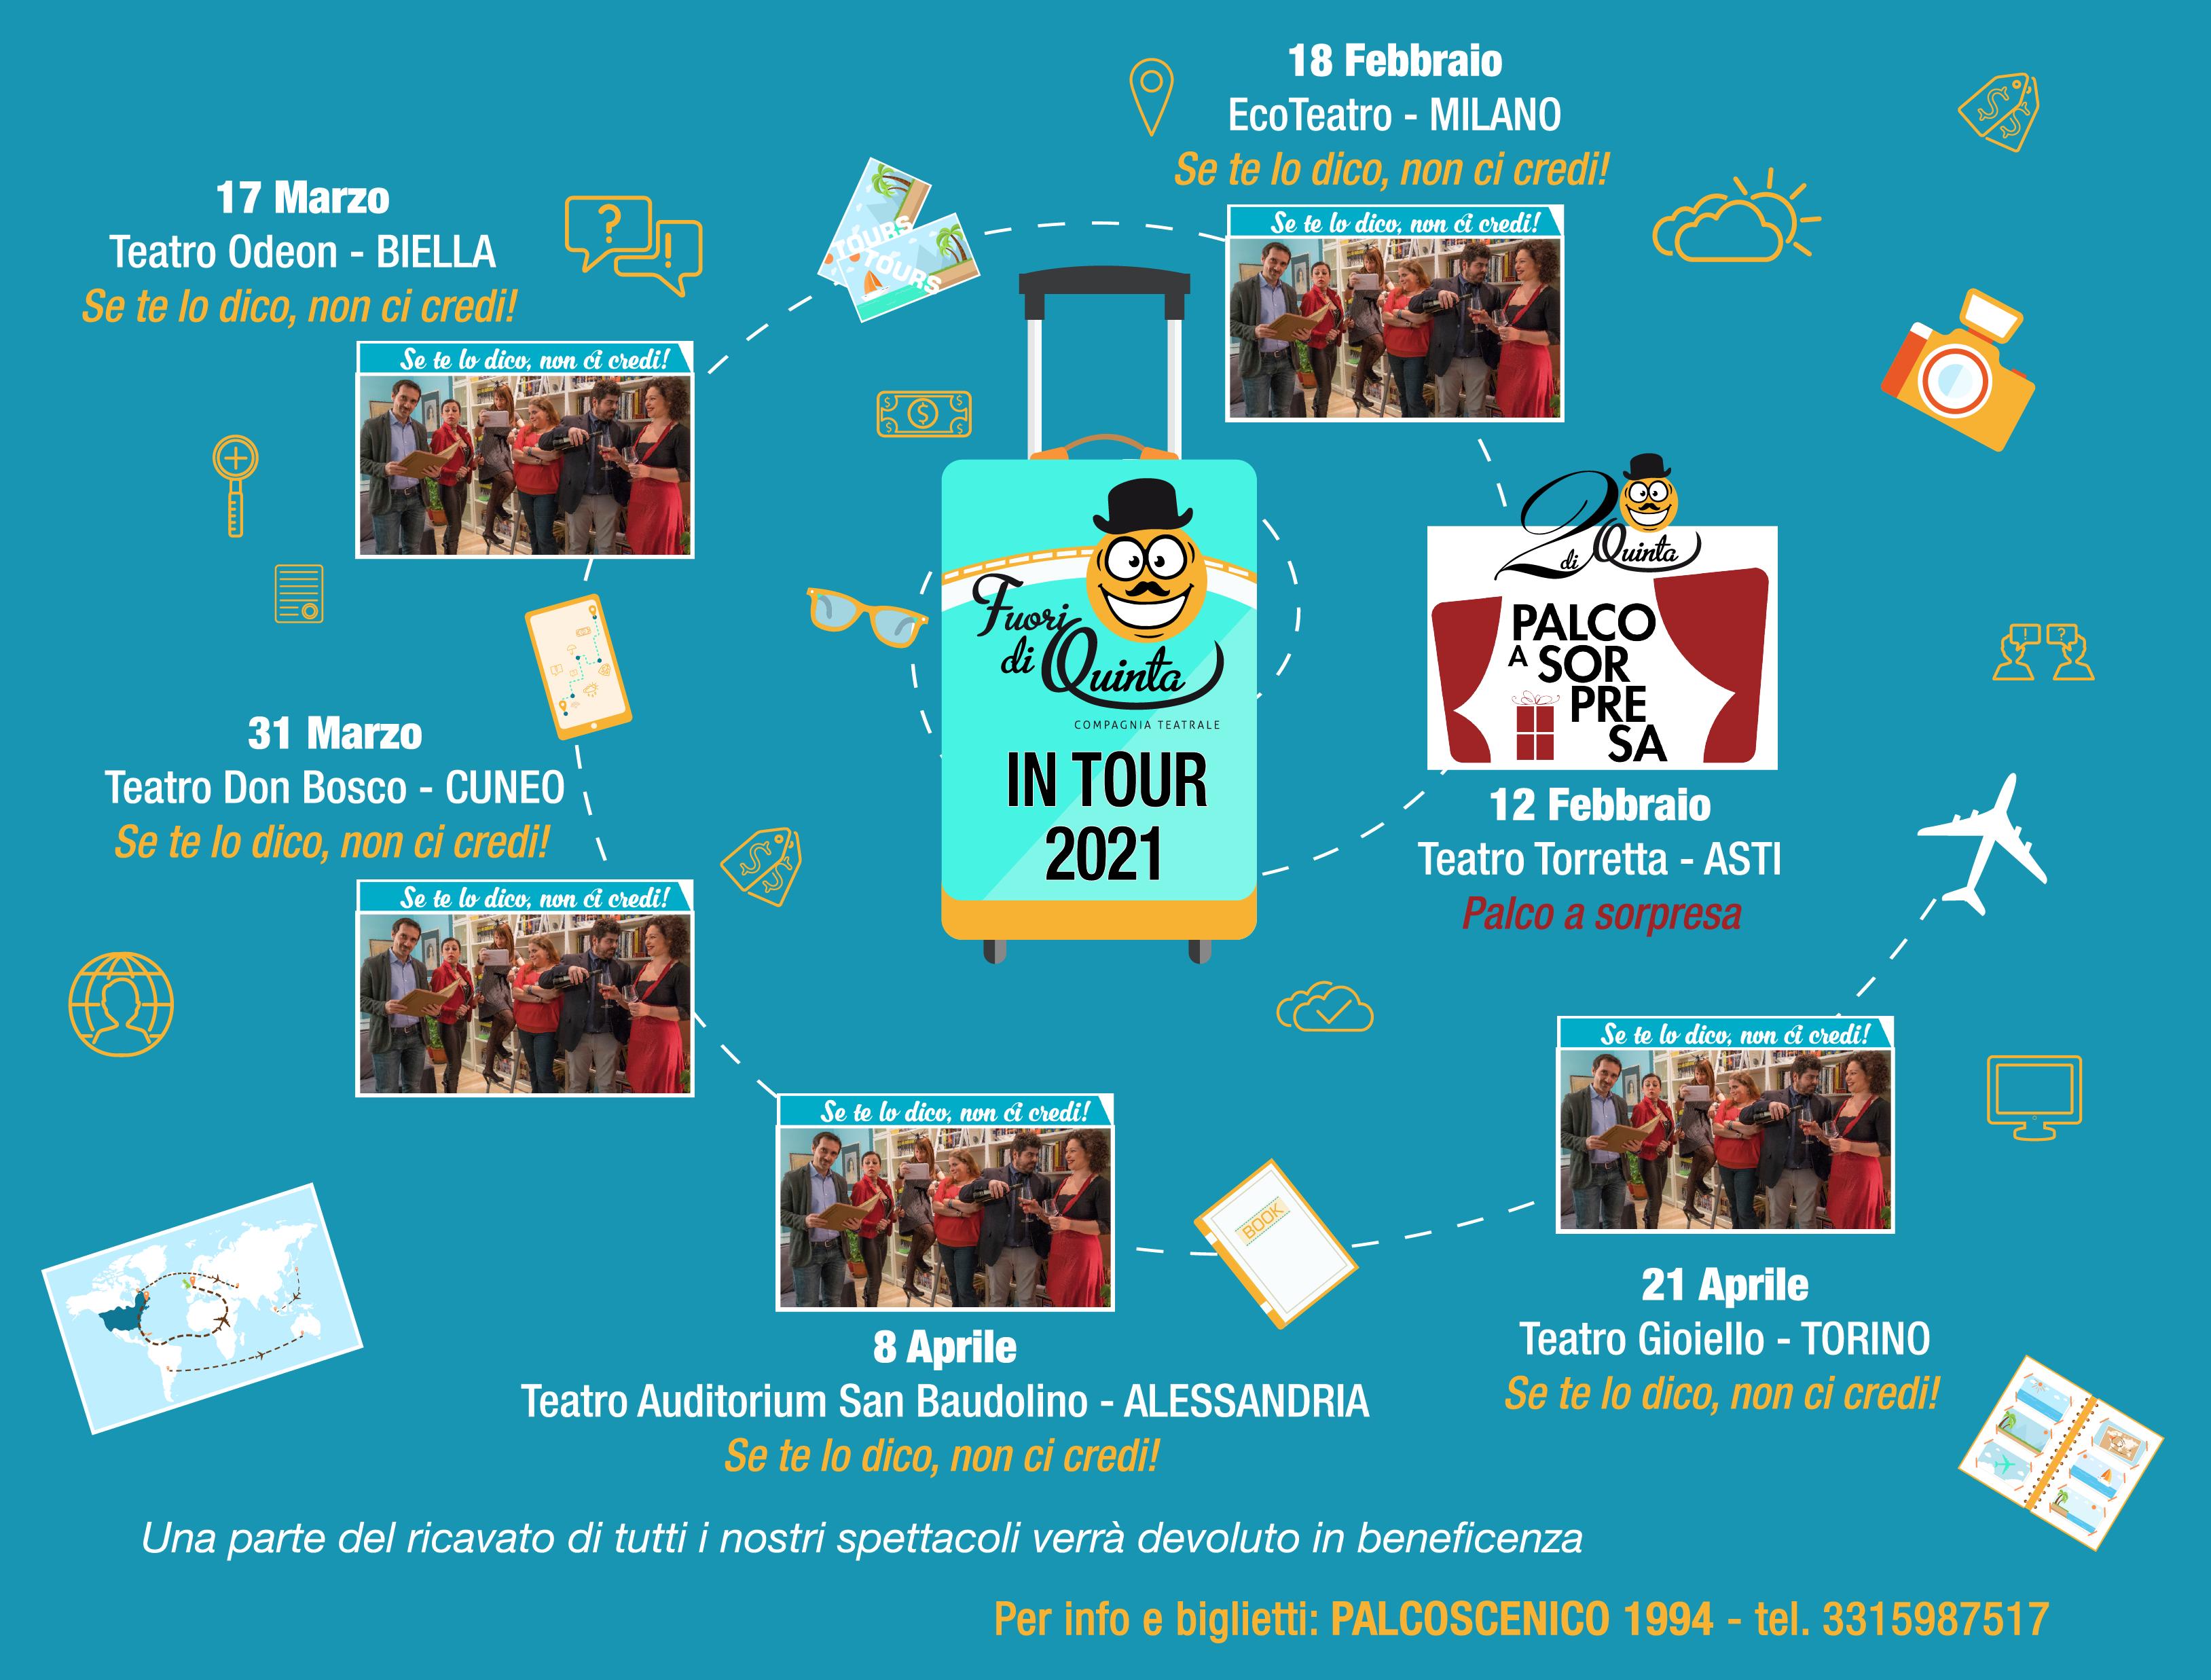 fdq in tour 2021-01-01